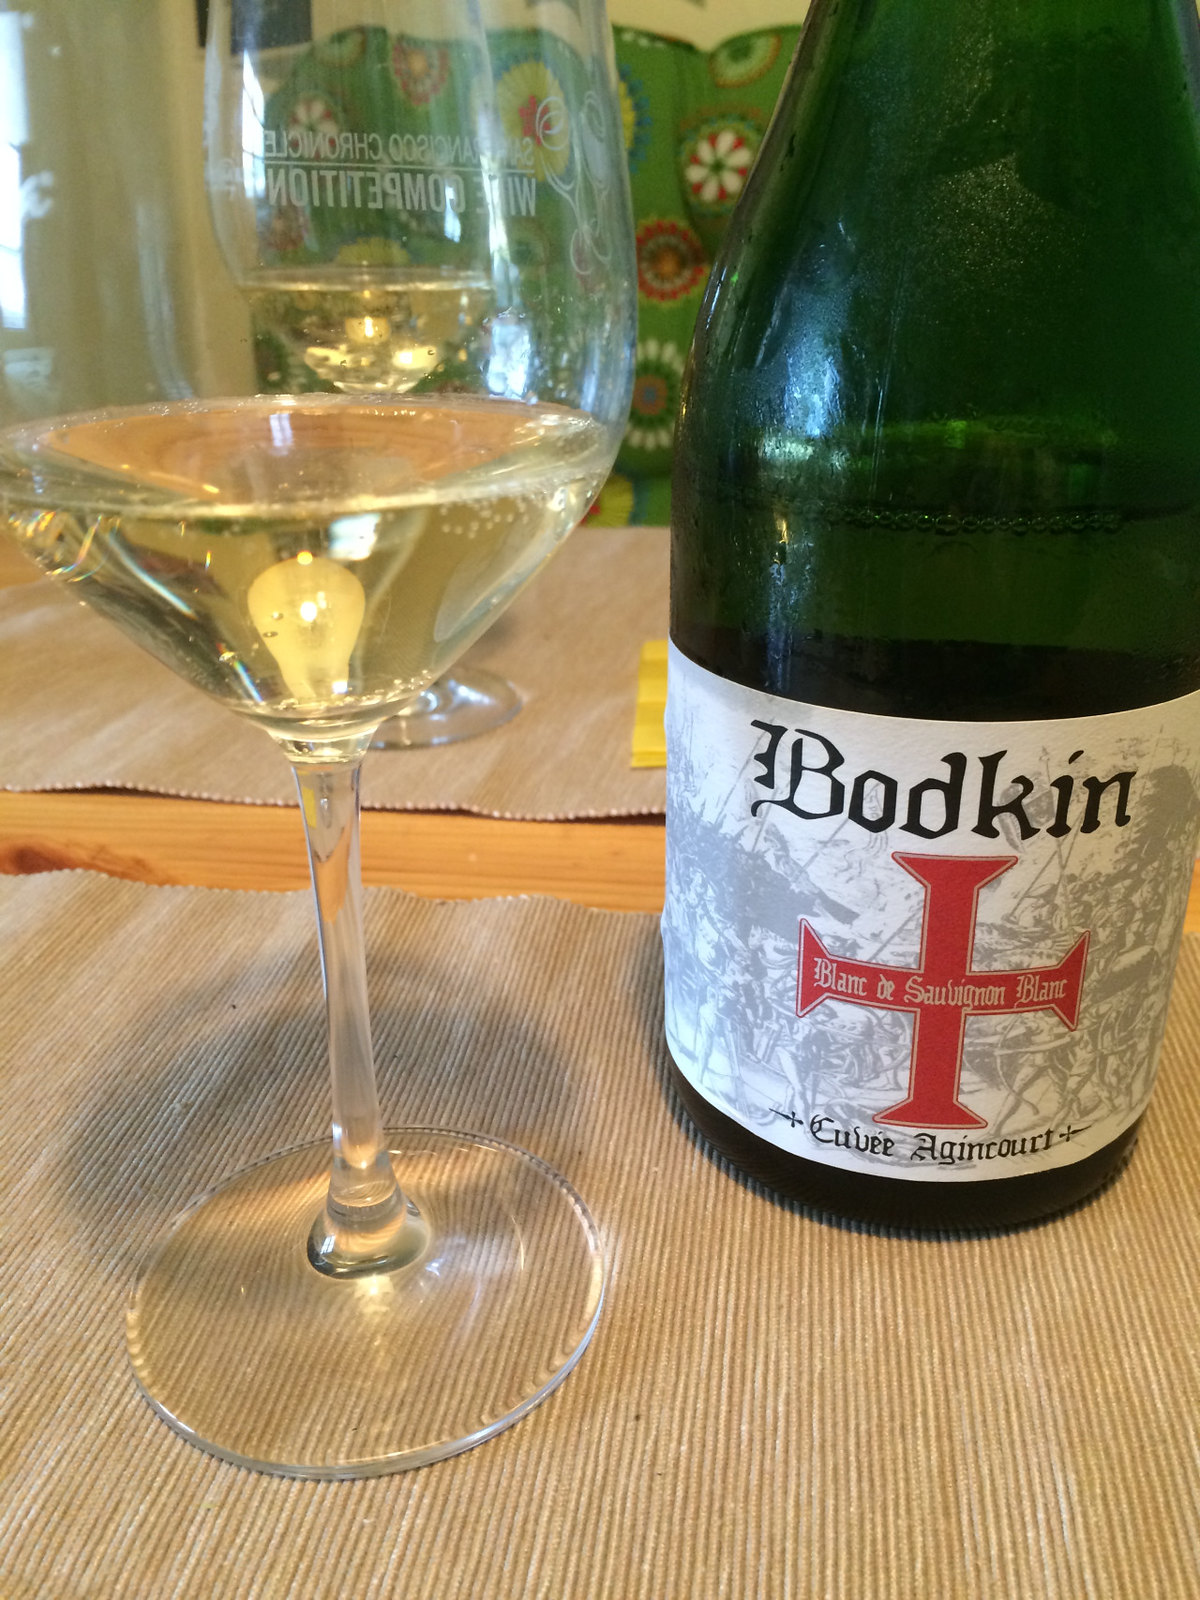 Bodkin Blanc de Sauvignon Blanc and Emmentaler Cheese 2